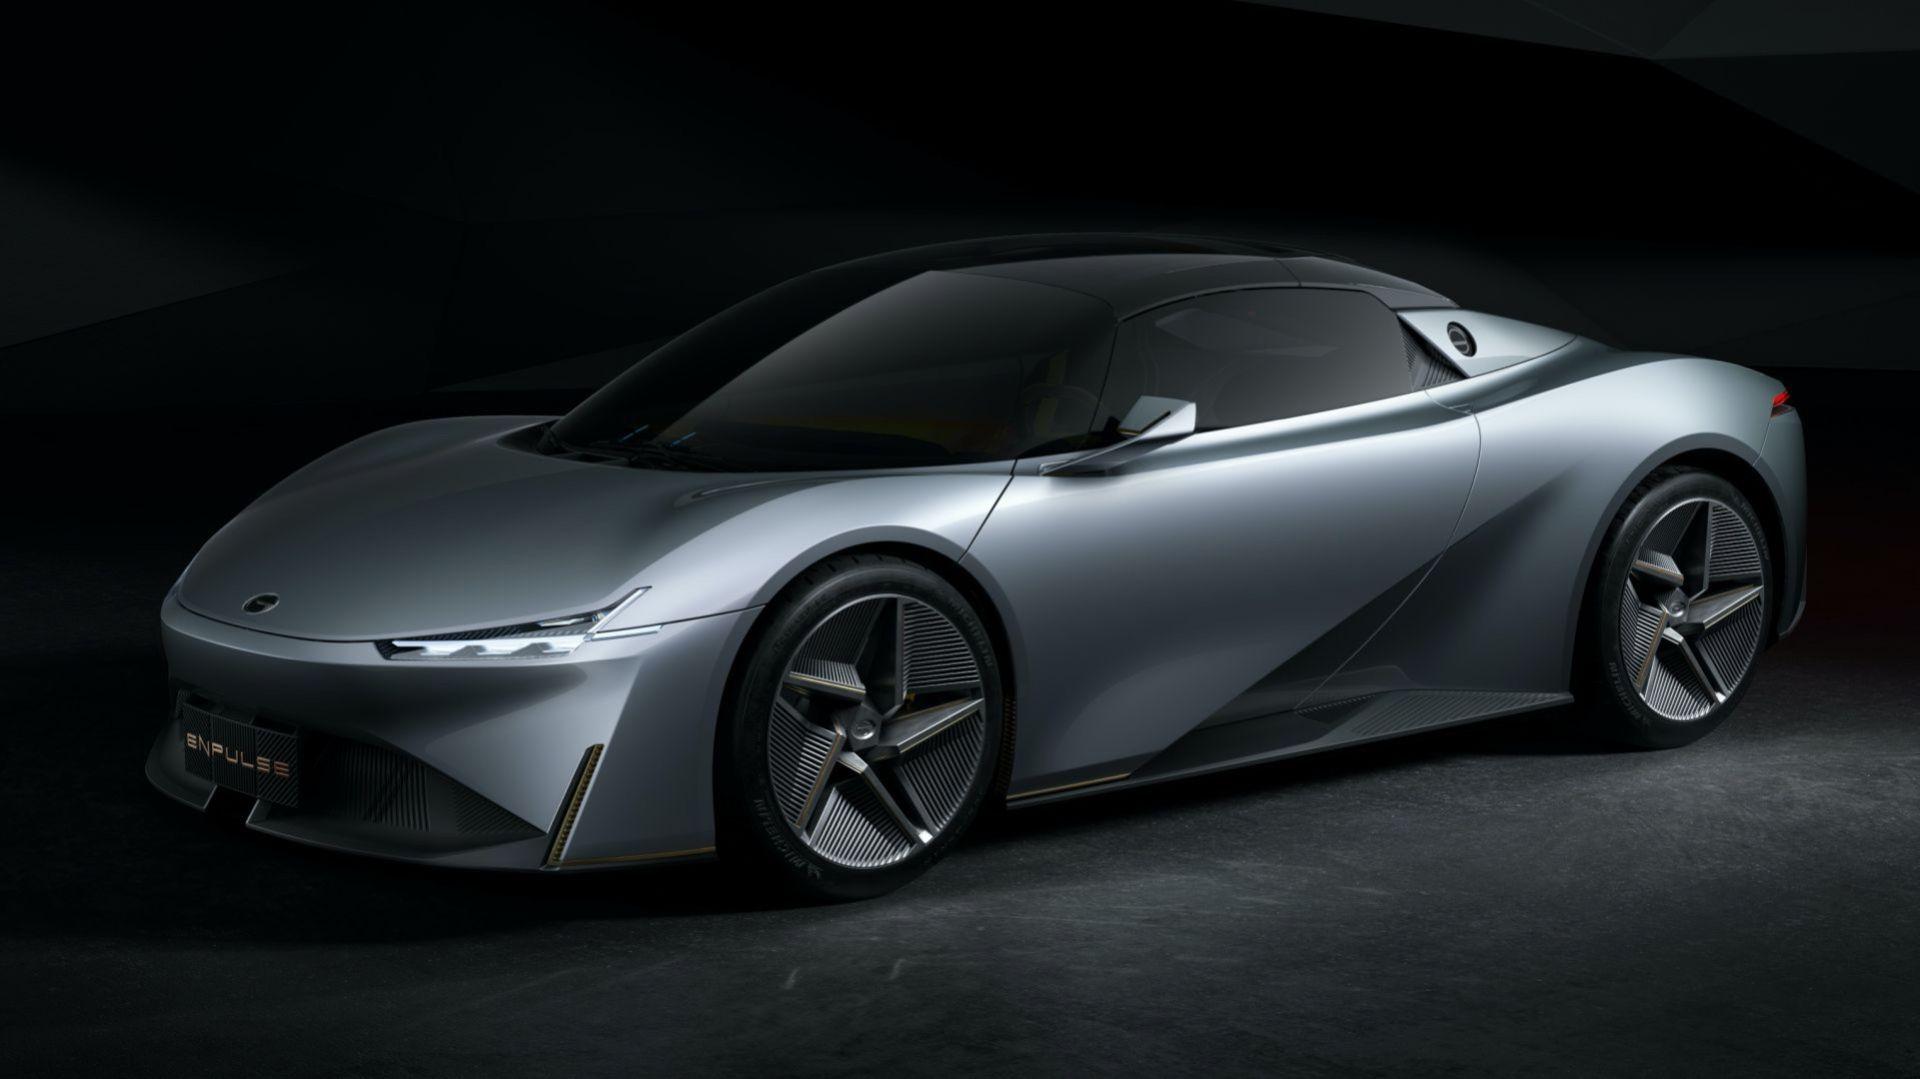 GAC visar eldrivna sportbilen Enpulse